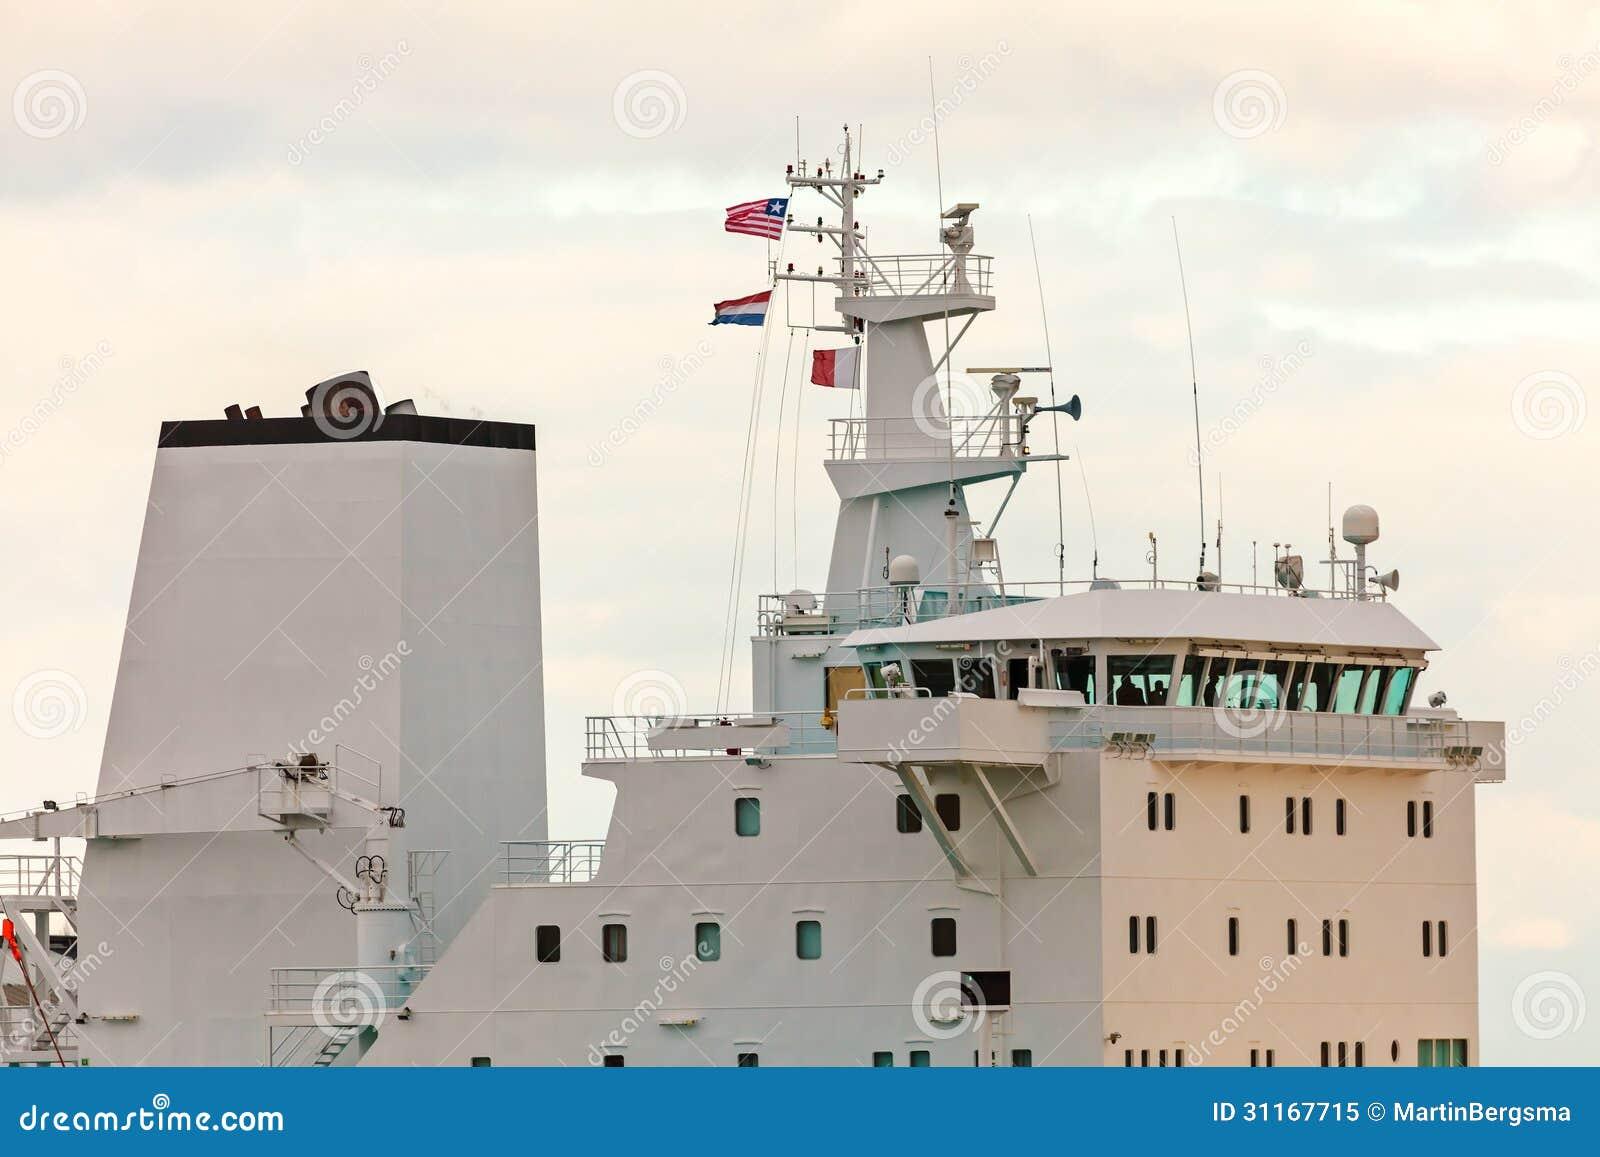 Wheelhouse Deck Of A Modern Industrial Ship Royalty Free Stock Photo - Image: 31167715